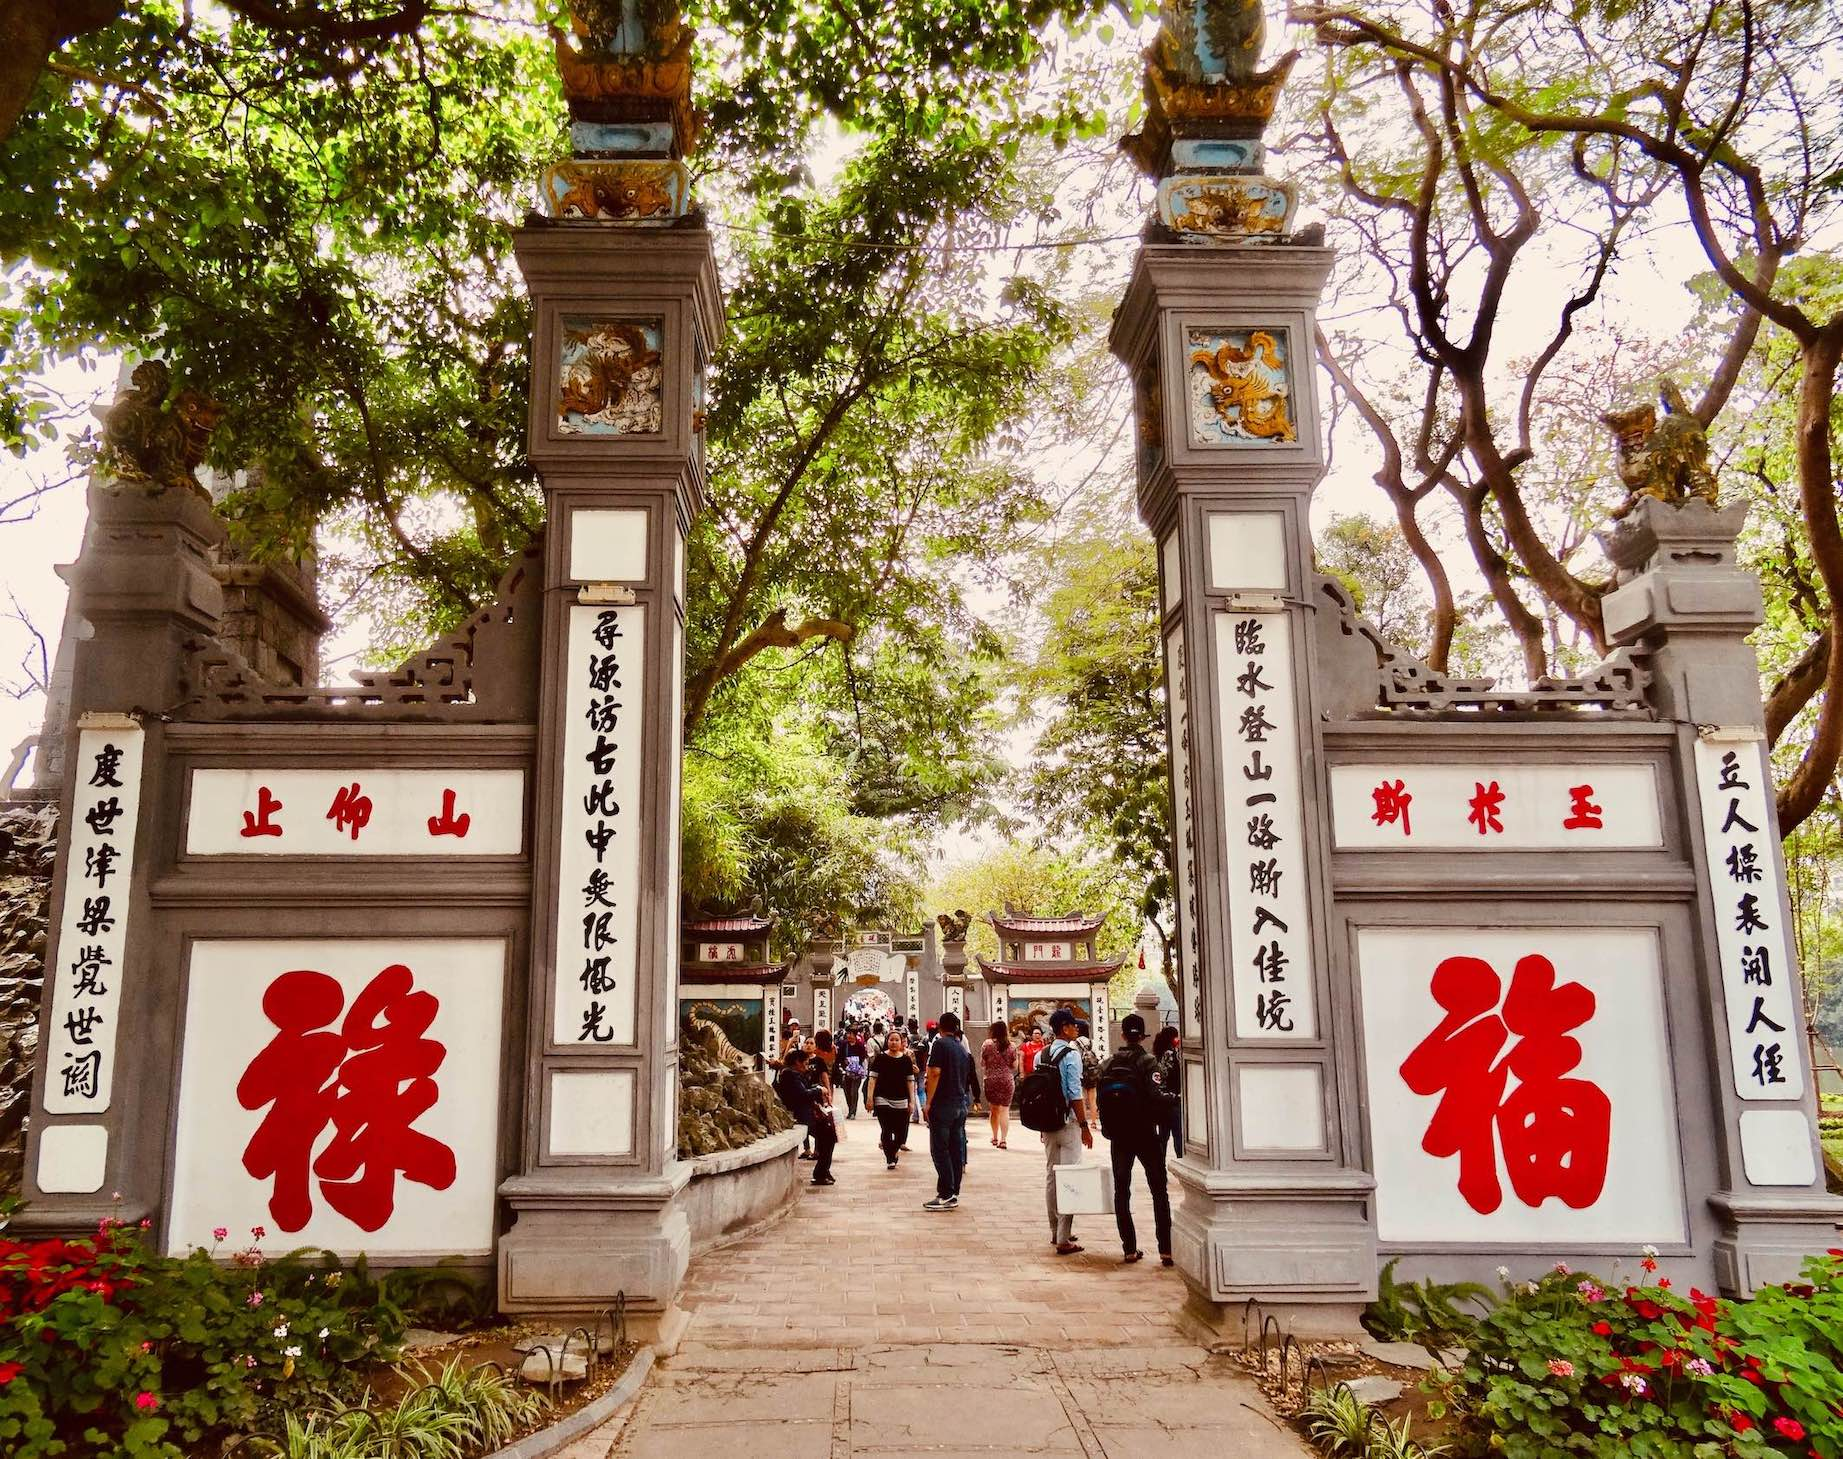 Ngoc Son Temple Hanoi.